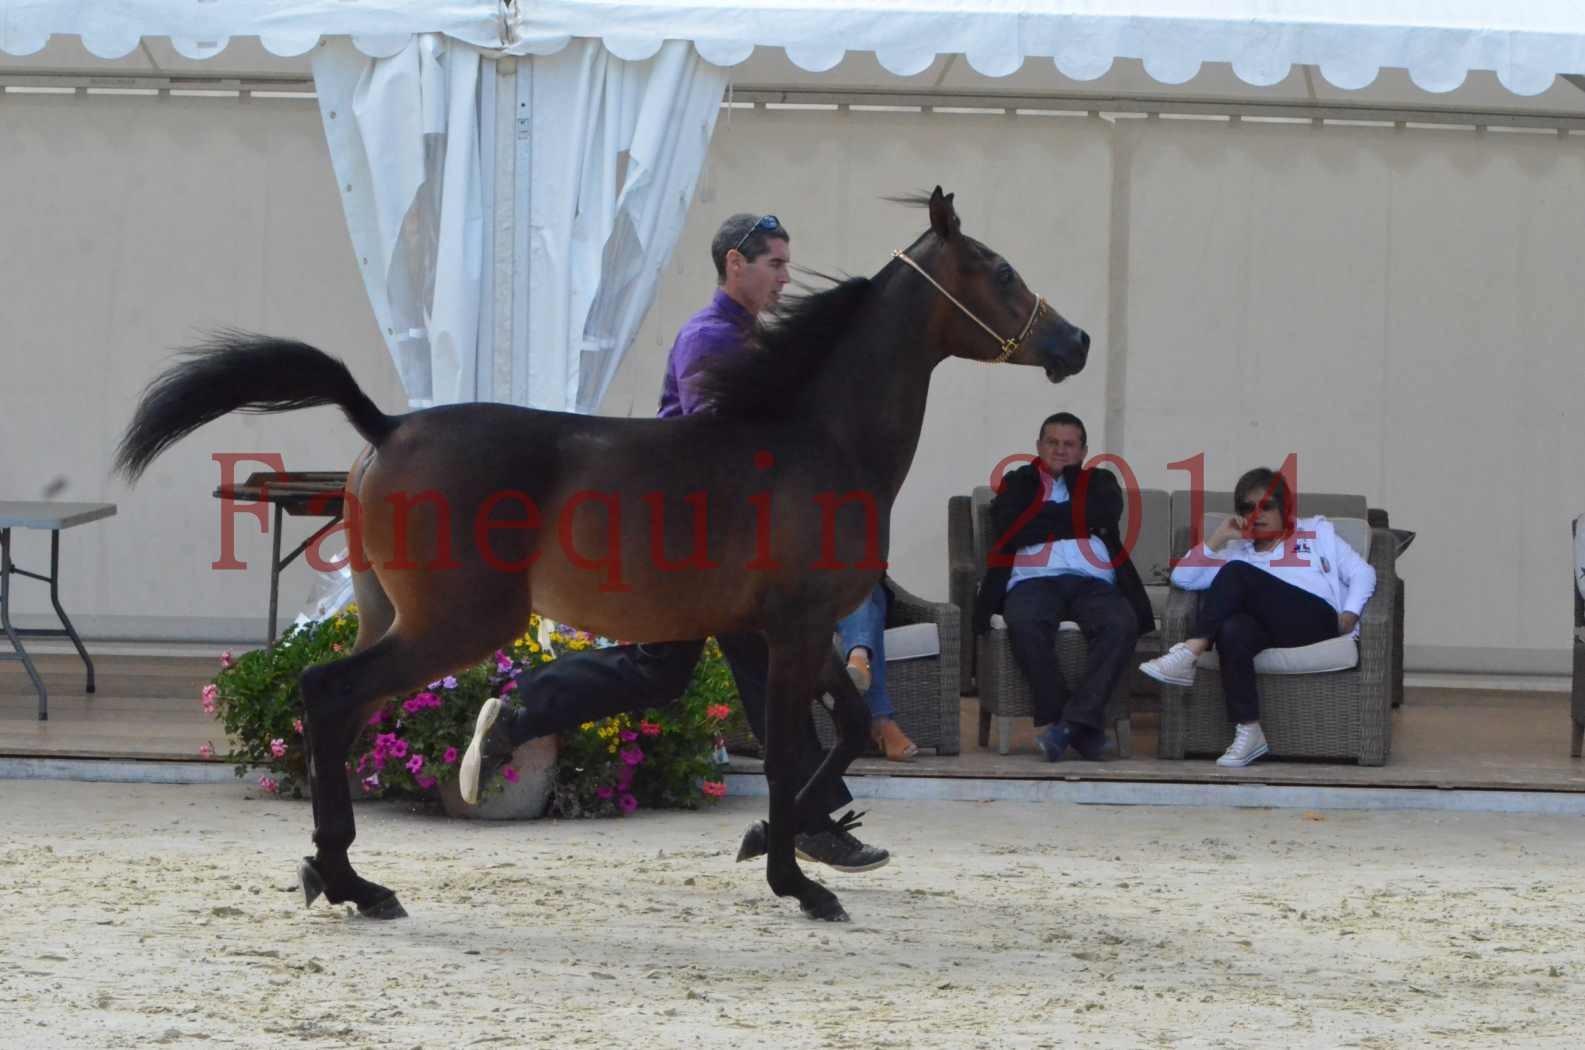 Championnat de FRANCE 2014 - Amateurs - SH FARAJAA - 15